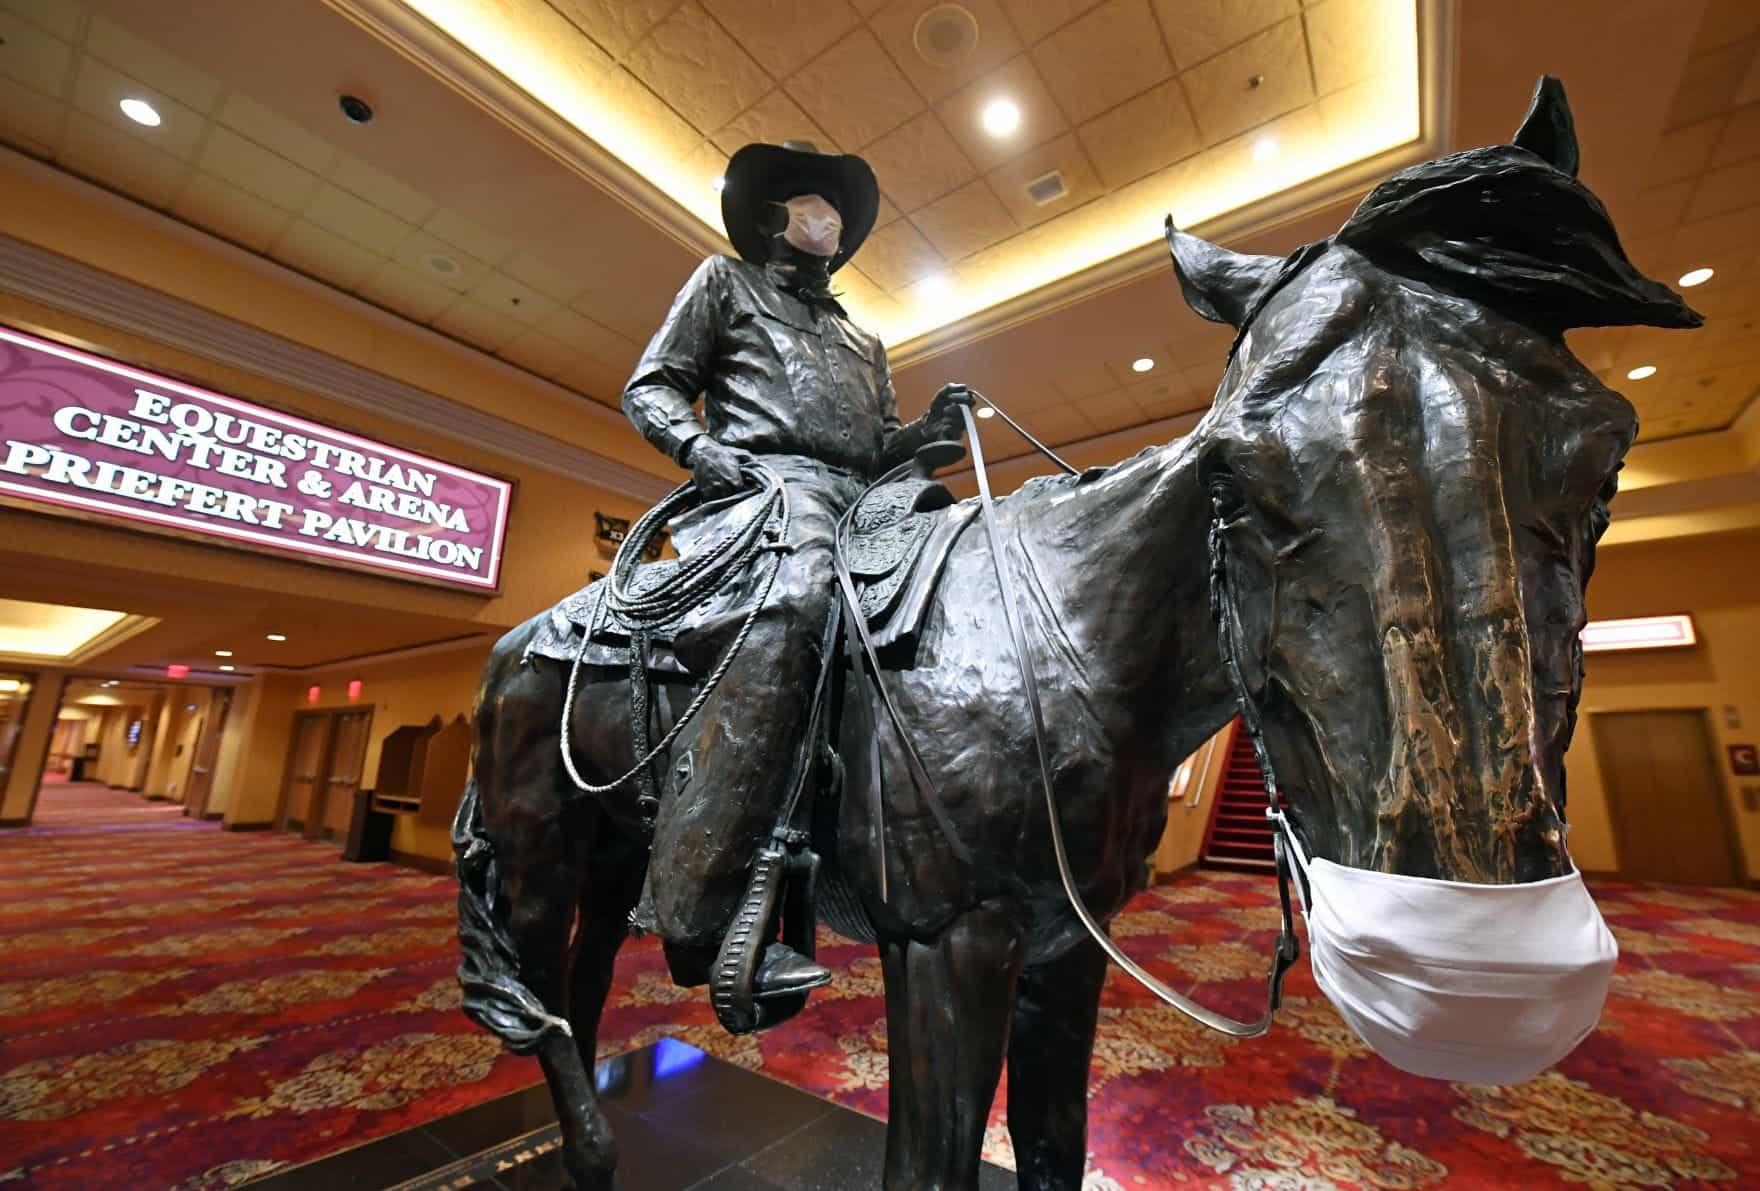 Patung perunggu Benny Binion, pencipta World Series of Poker.